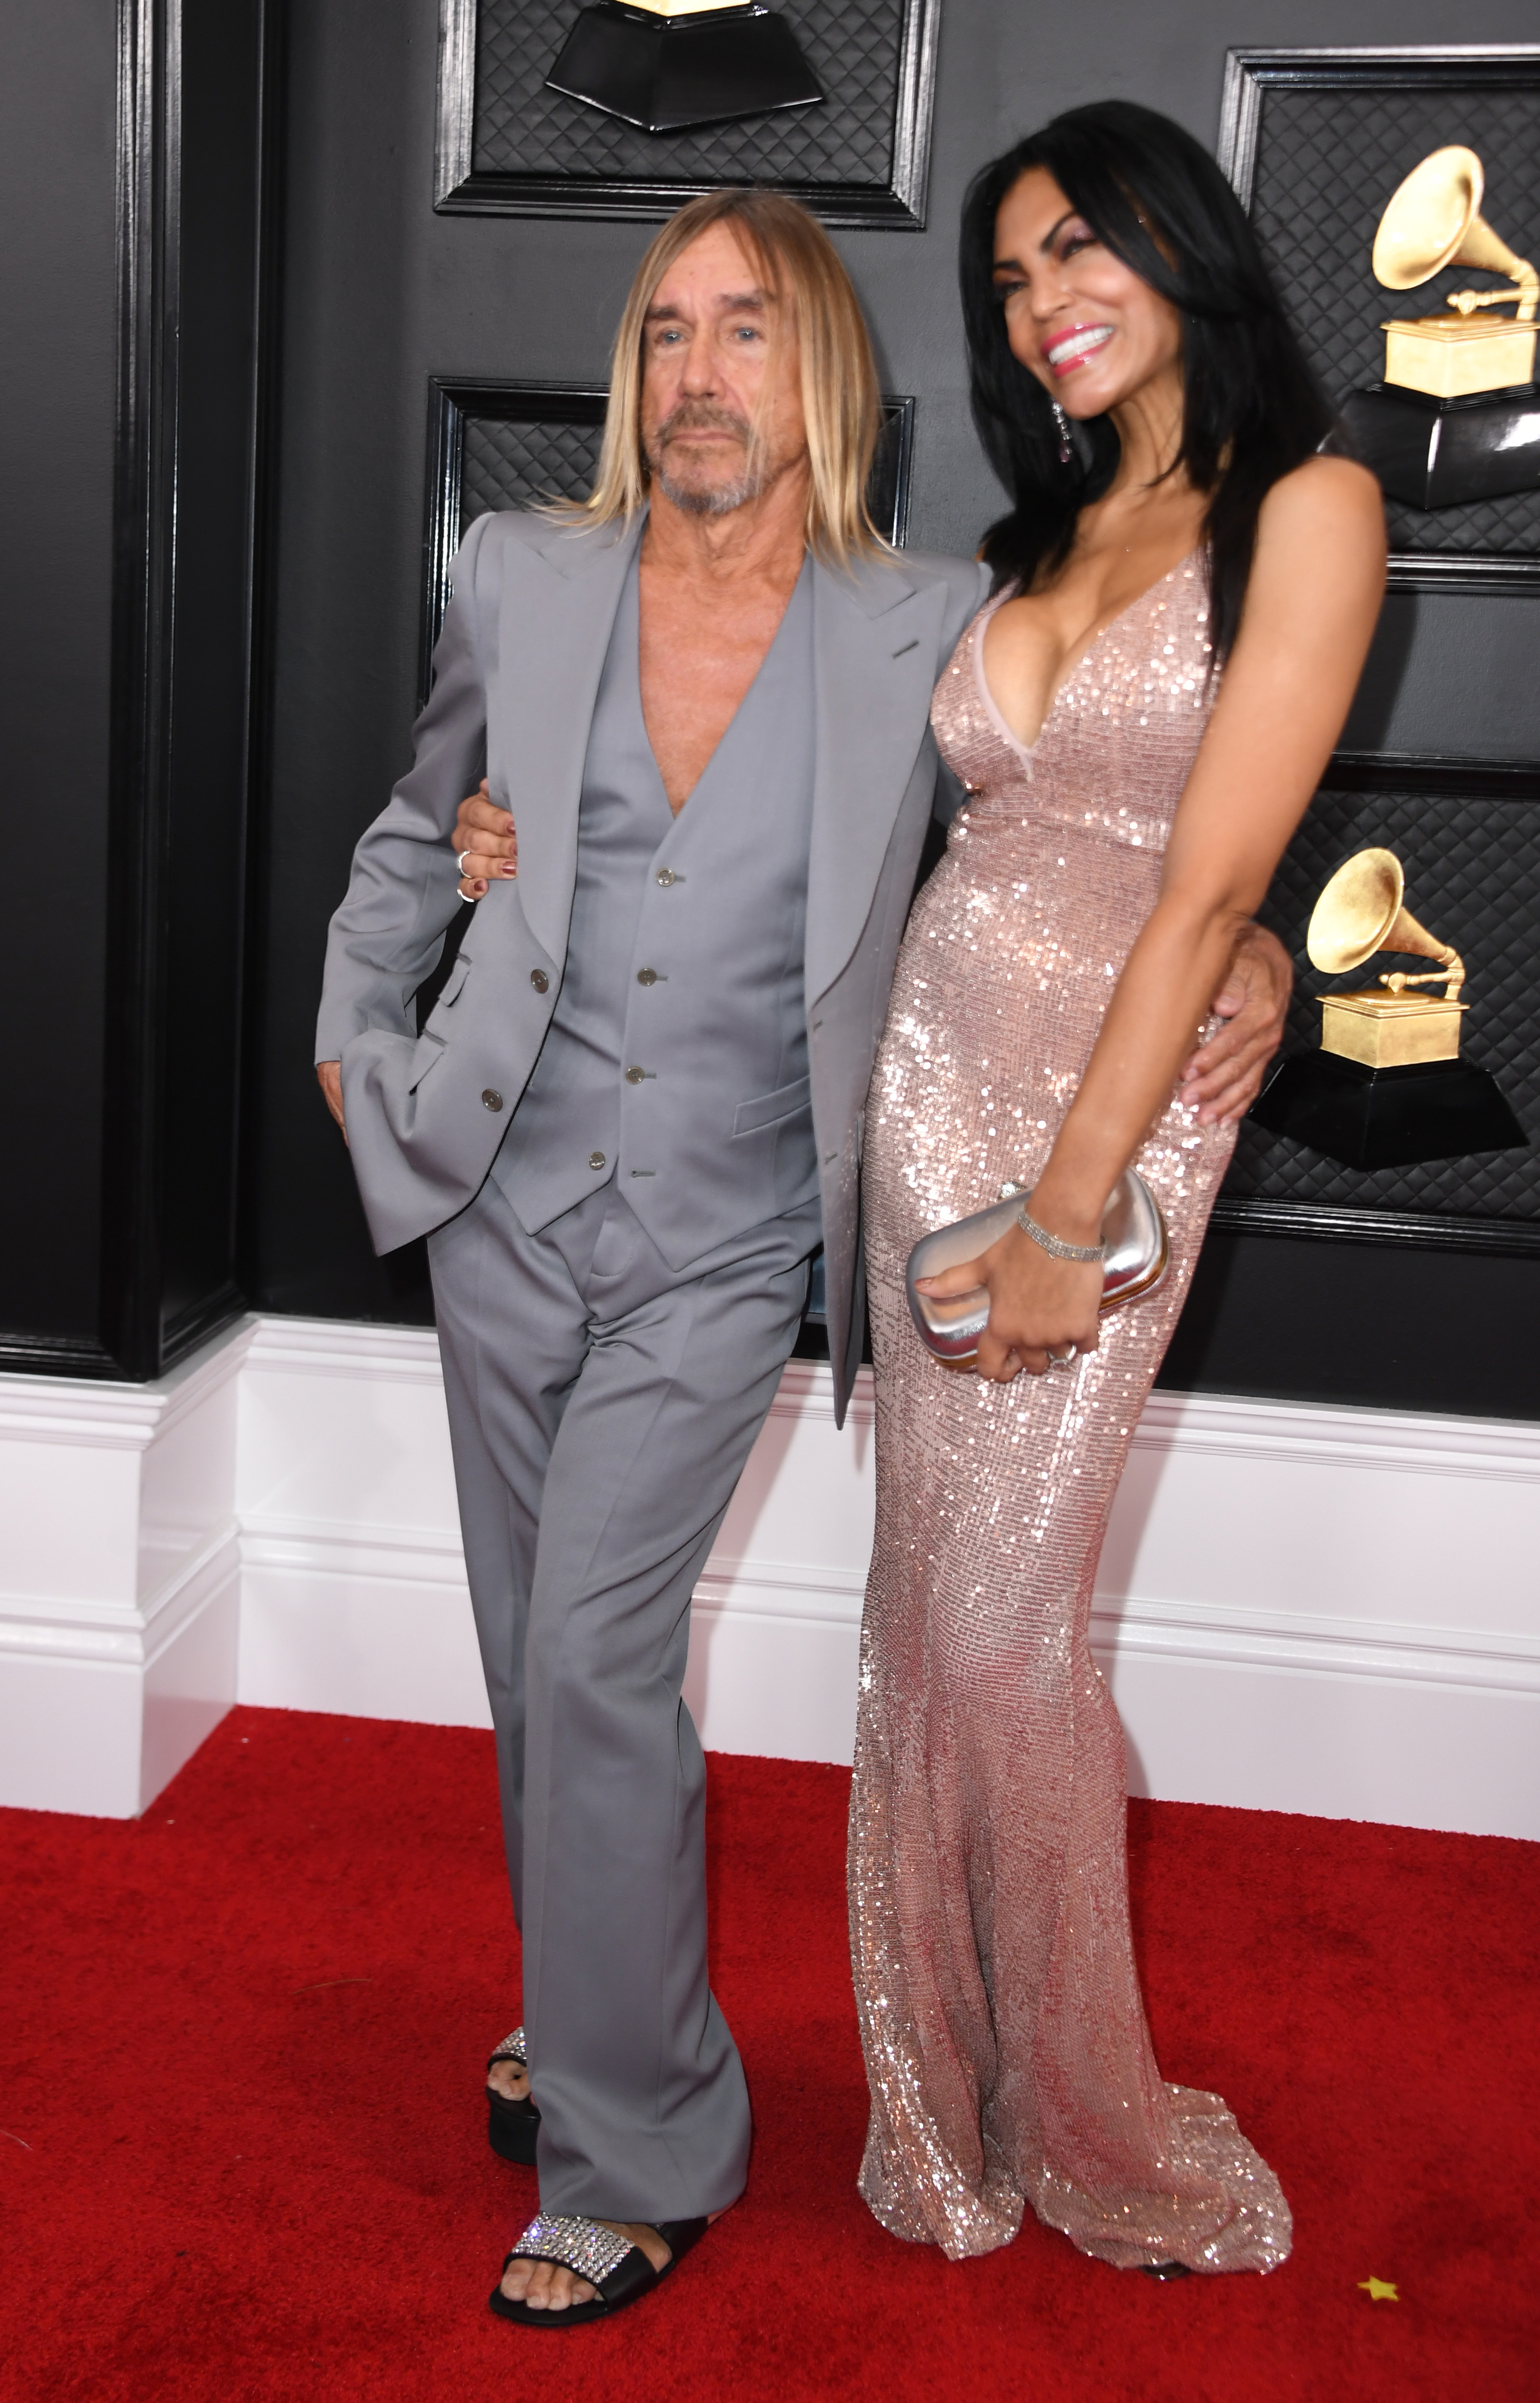 Iggy Pop and his wife Nina Alu